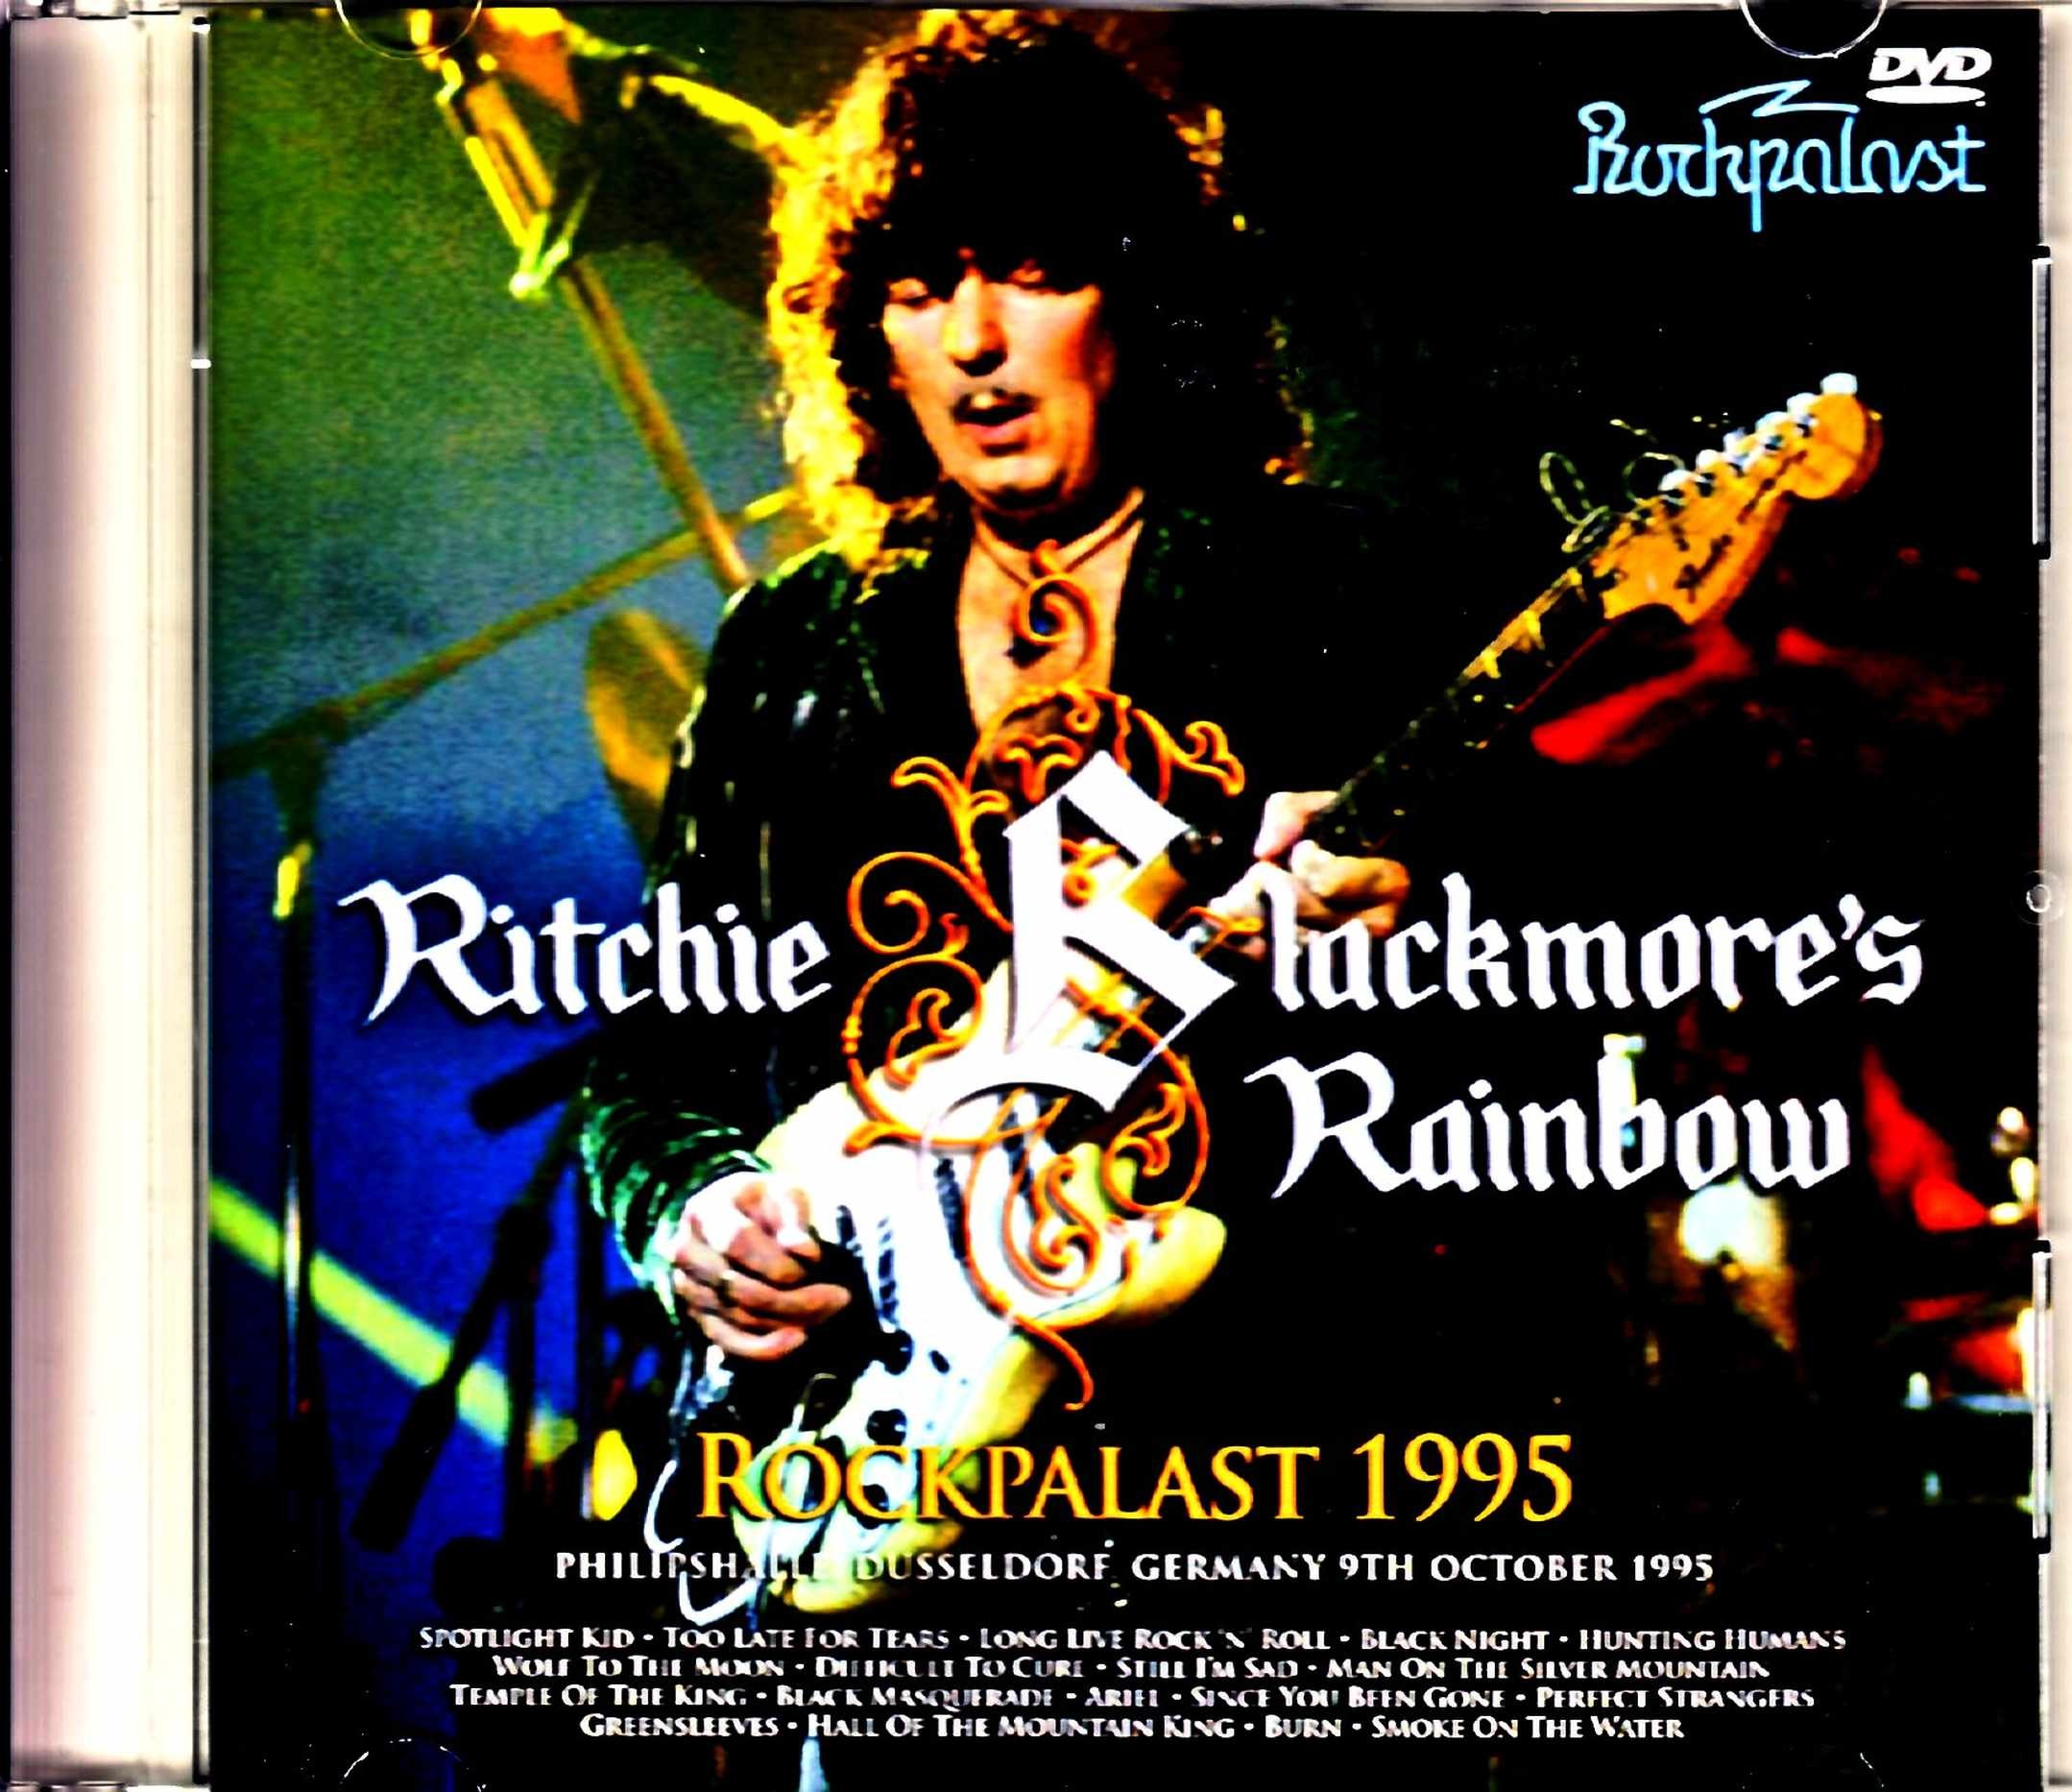 Ritchie Blackmore's Rainbow レインボー/Germany 1995 Best Quality